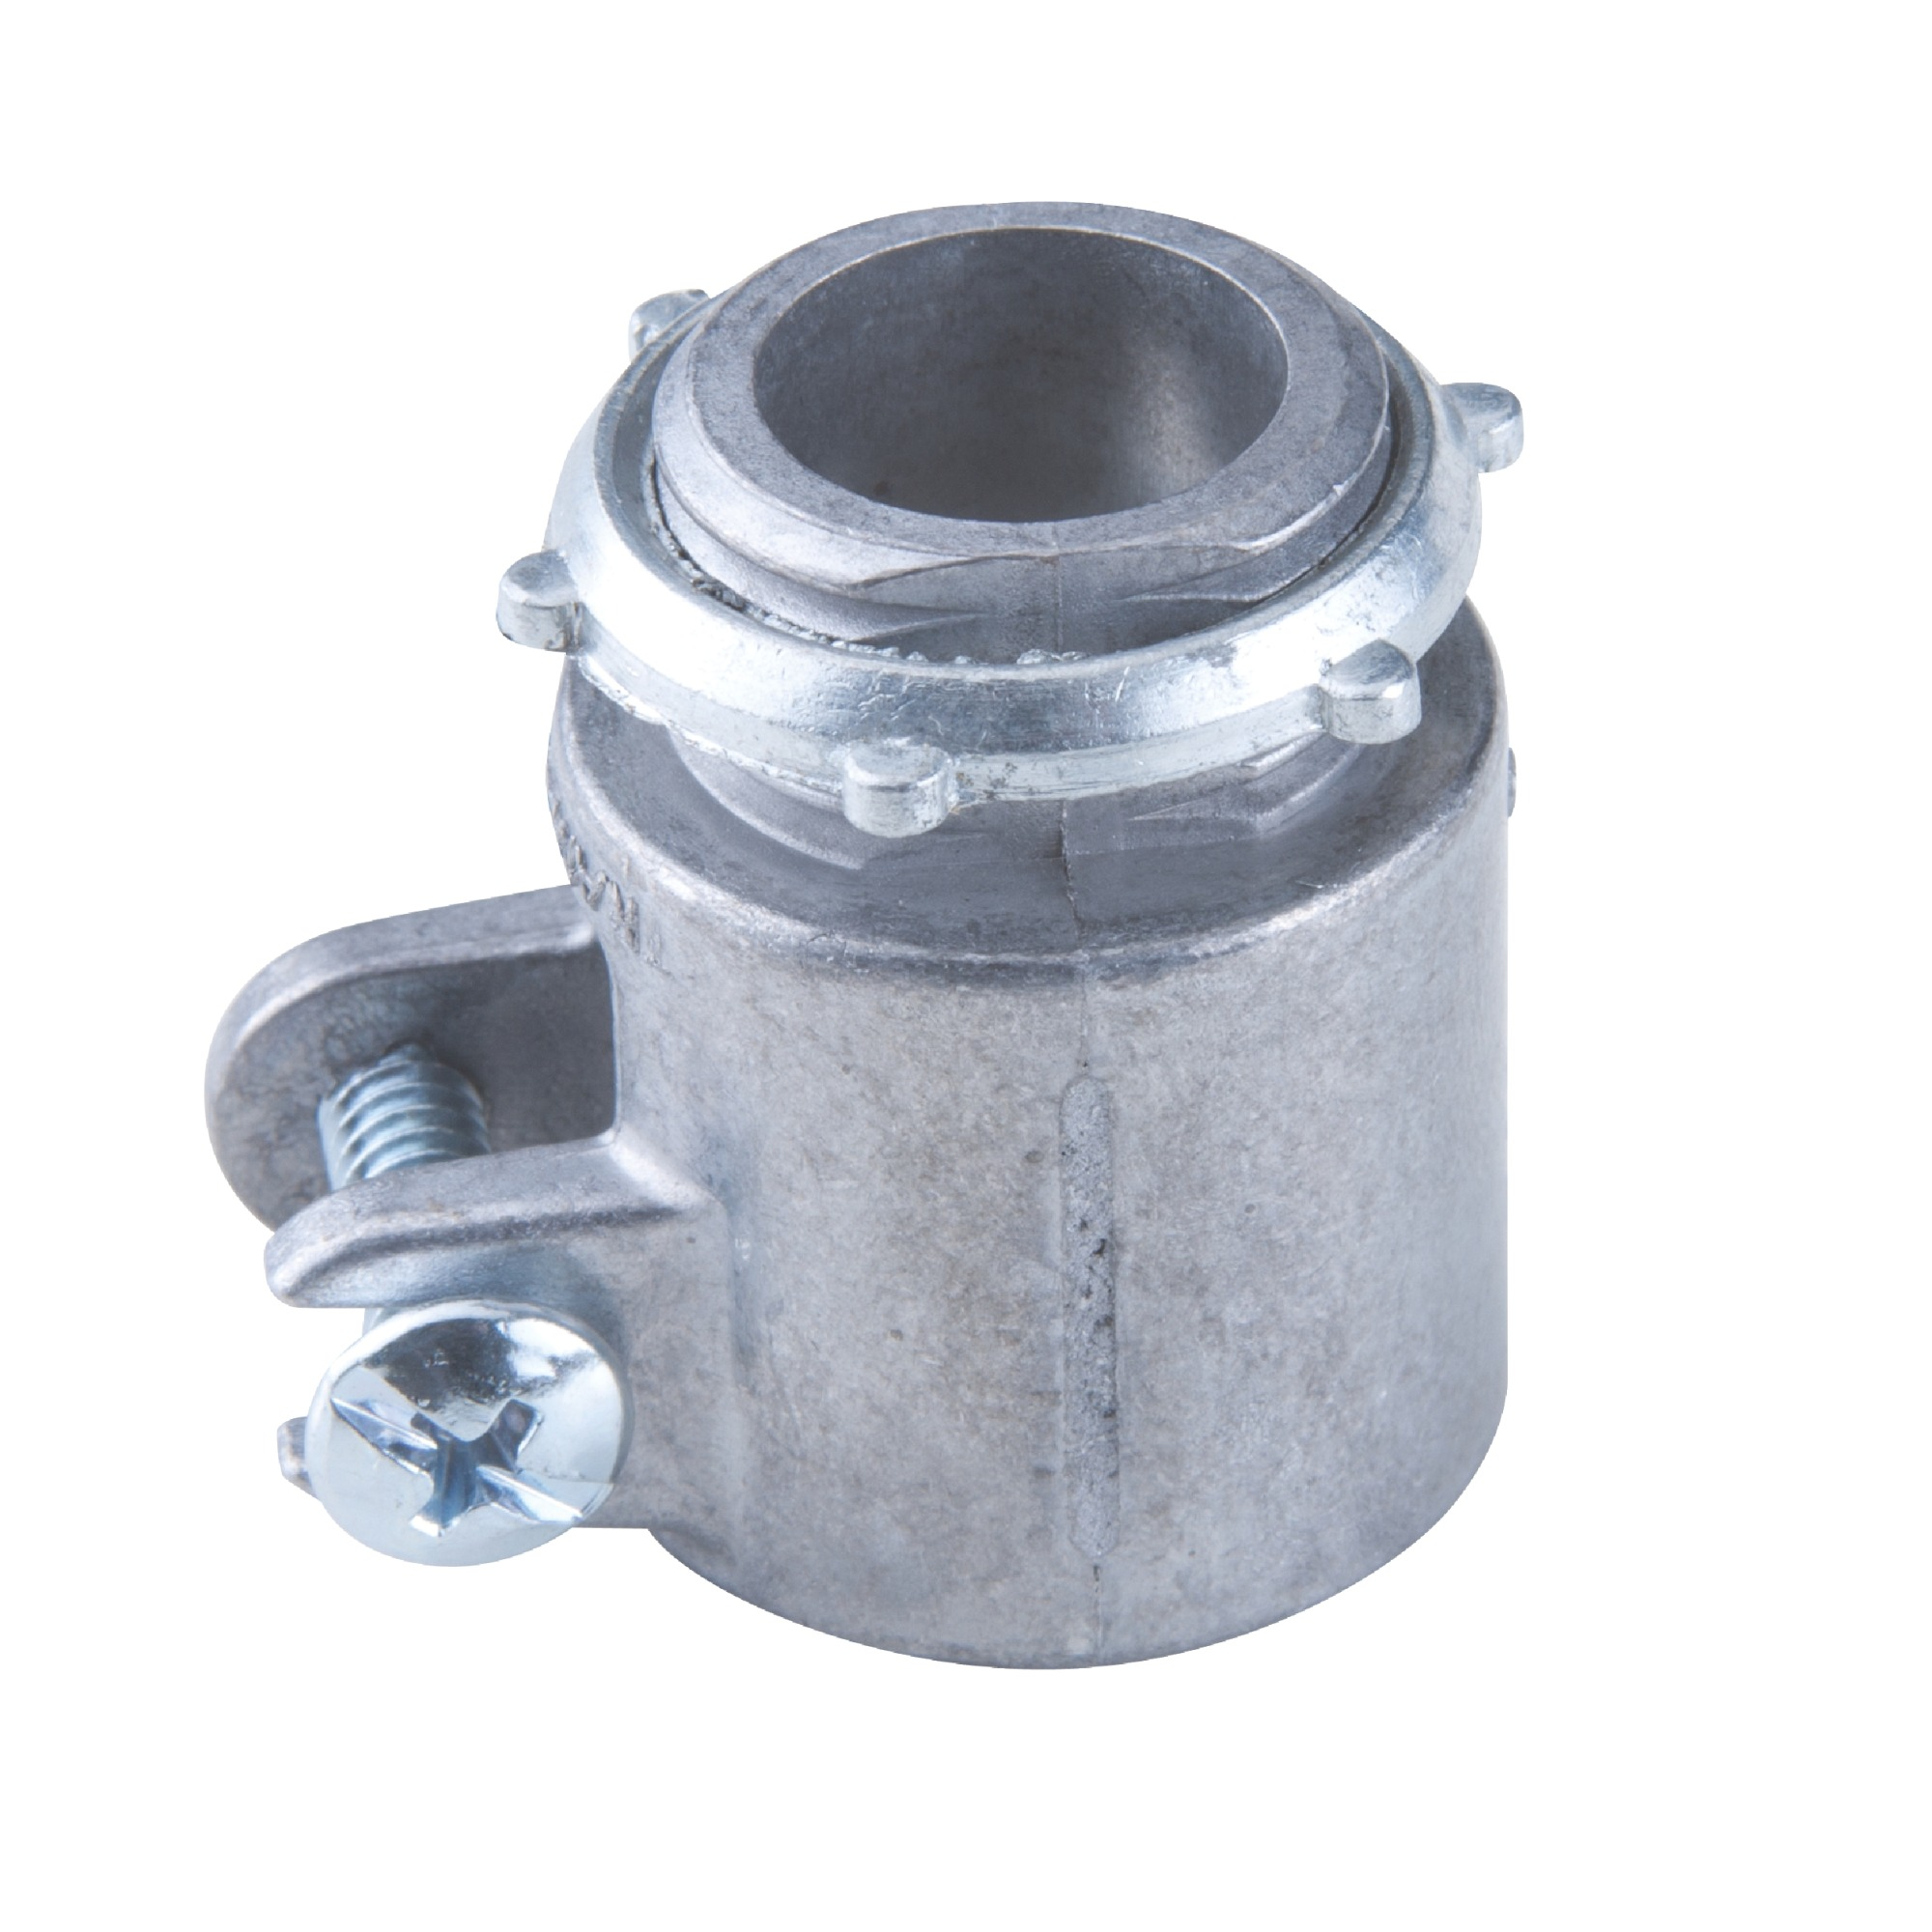 Conector Reto de Aluminio para Box com Rosca 114 - 56127026 - Tramontina